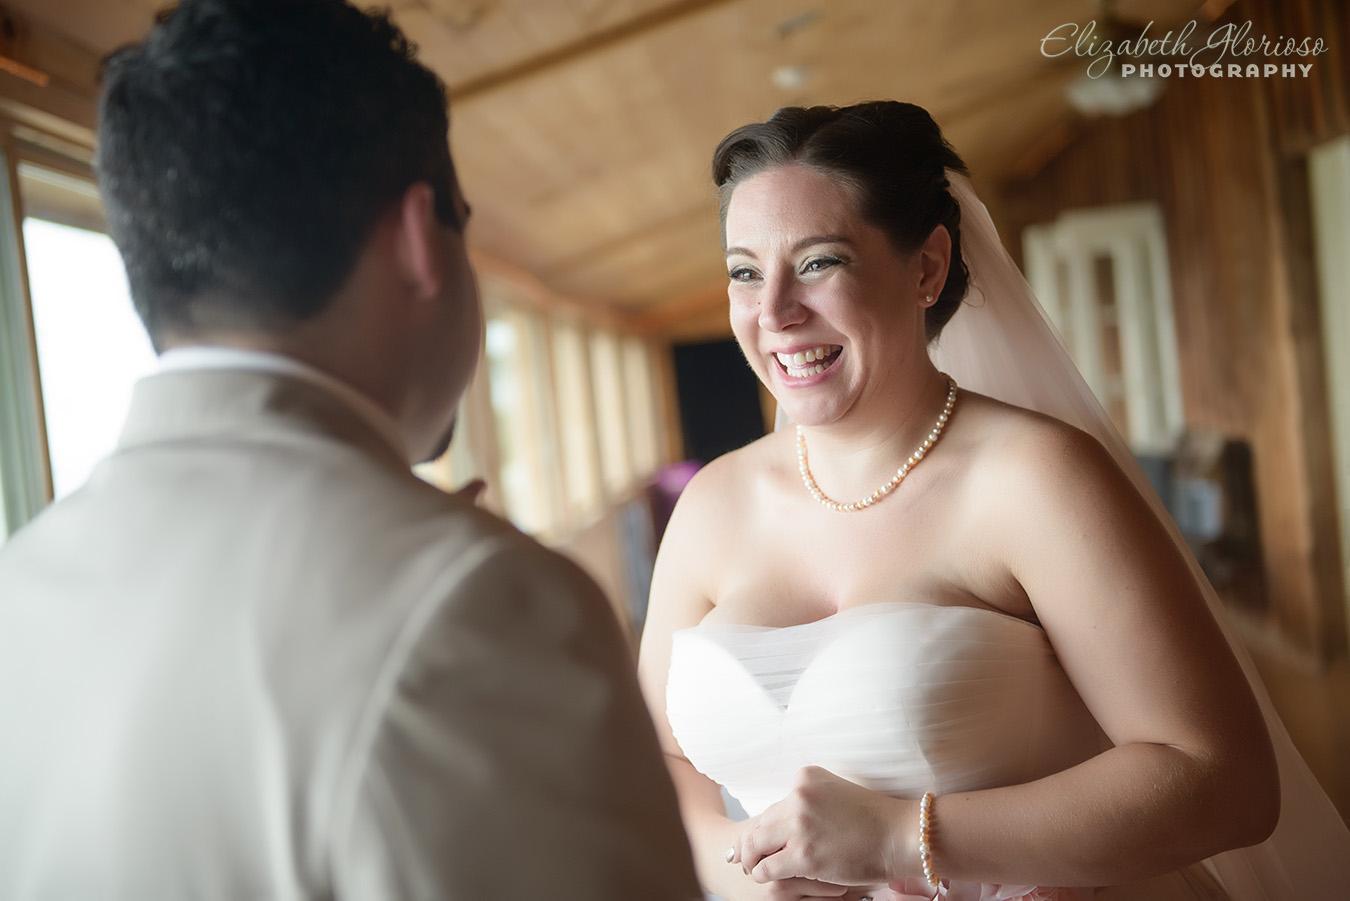 Vermilion_wedding_Glorioso Photography_1023